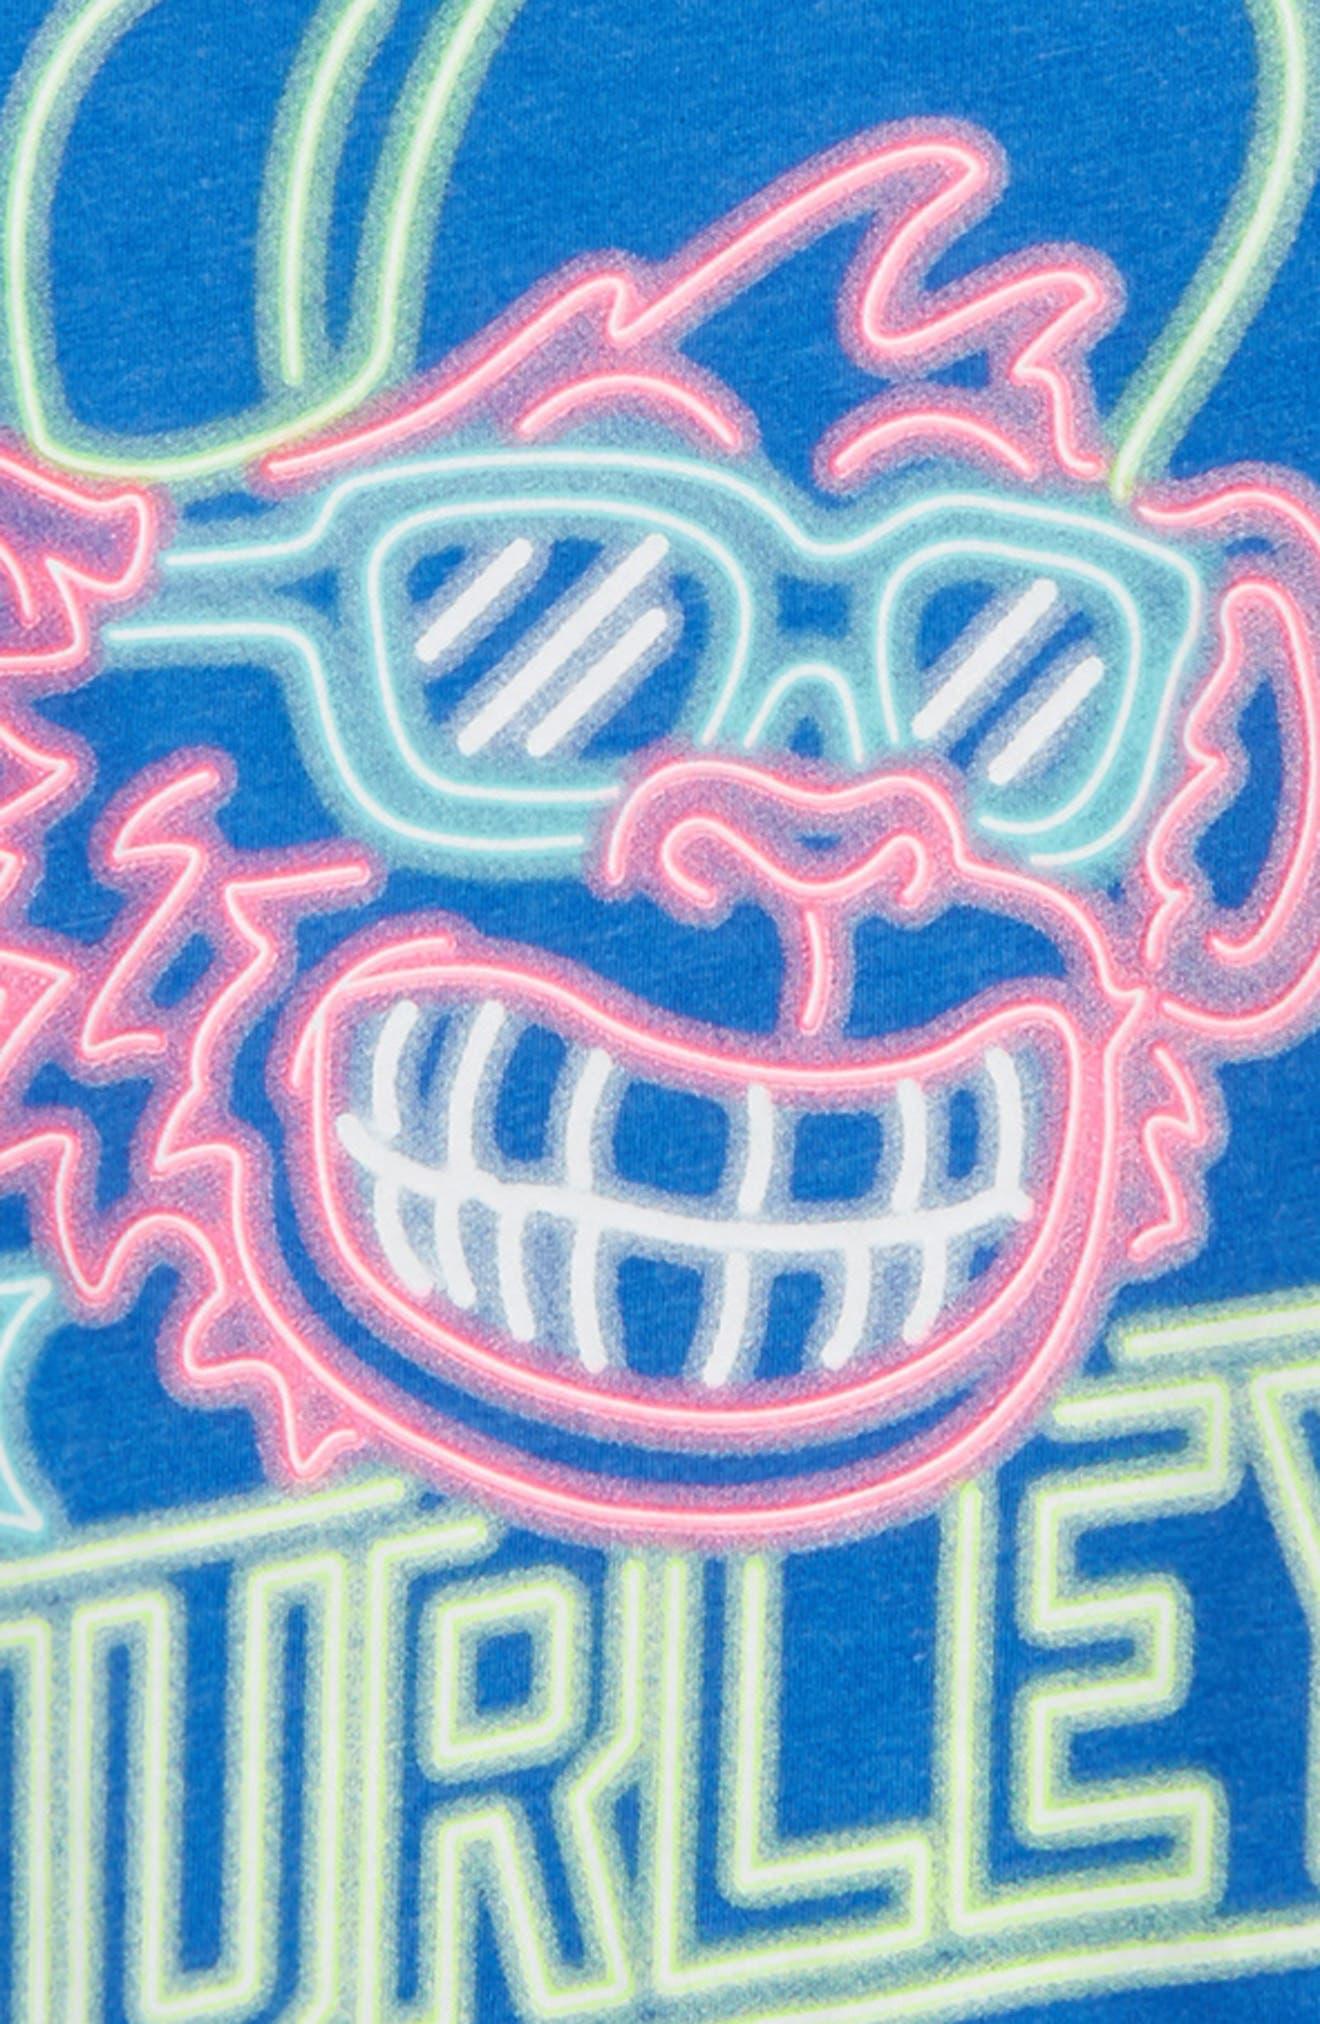 Neon Chimp Glow in the Dark T-Shirt,                             Alternate thumbnail 3, color,                             461